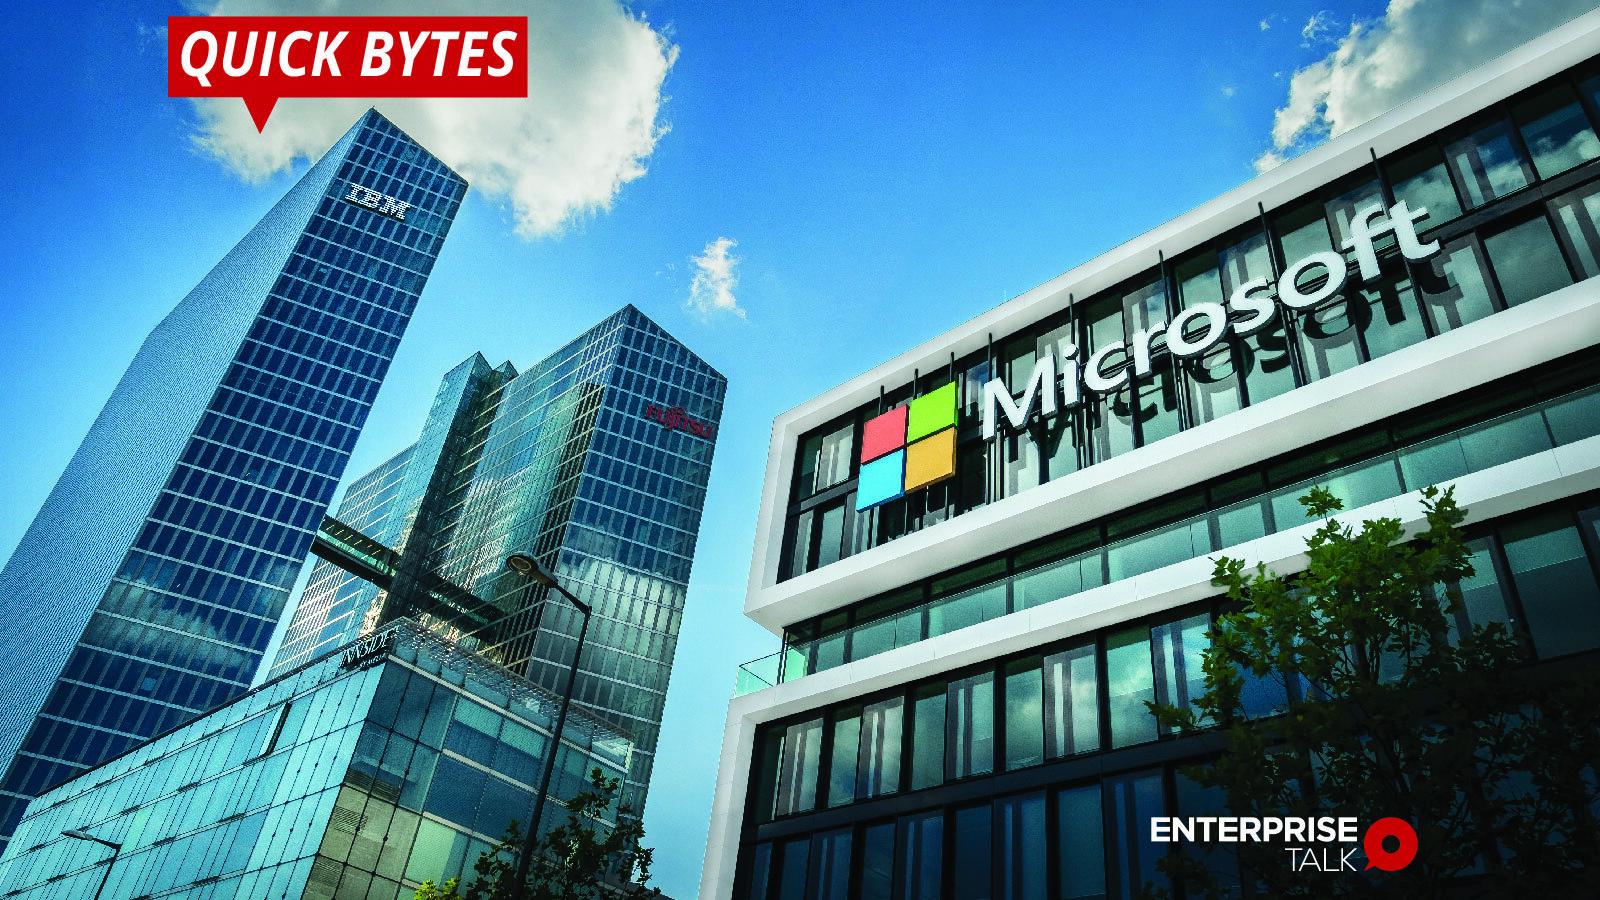 Microsoft, acquisition, 5G, cloud, wireless network, Azure, 5G networks, 5G wireless